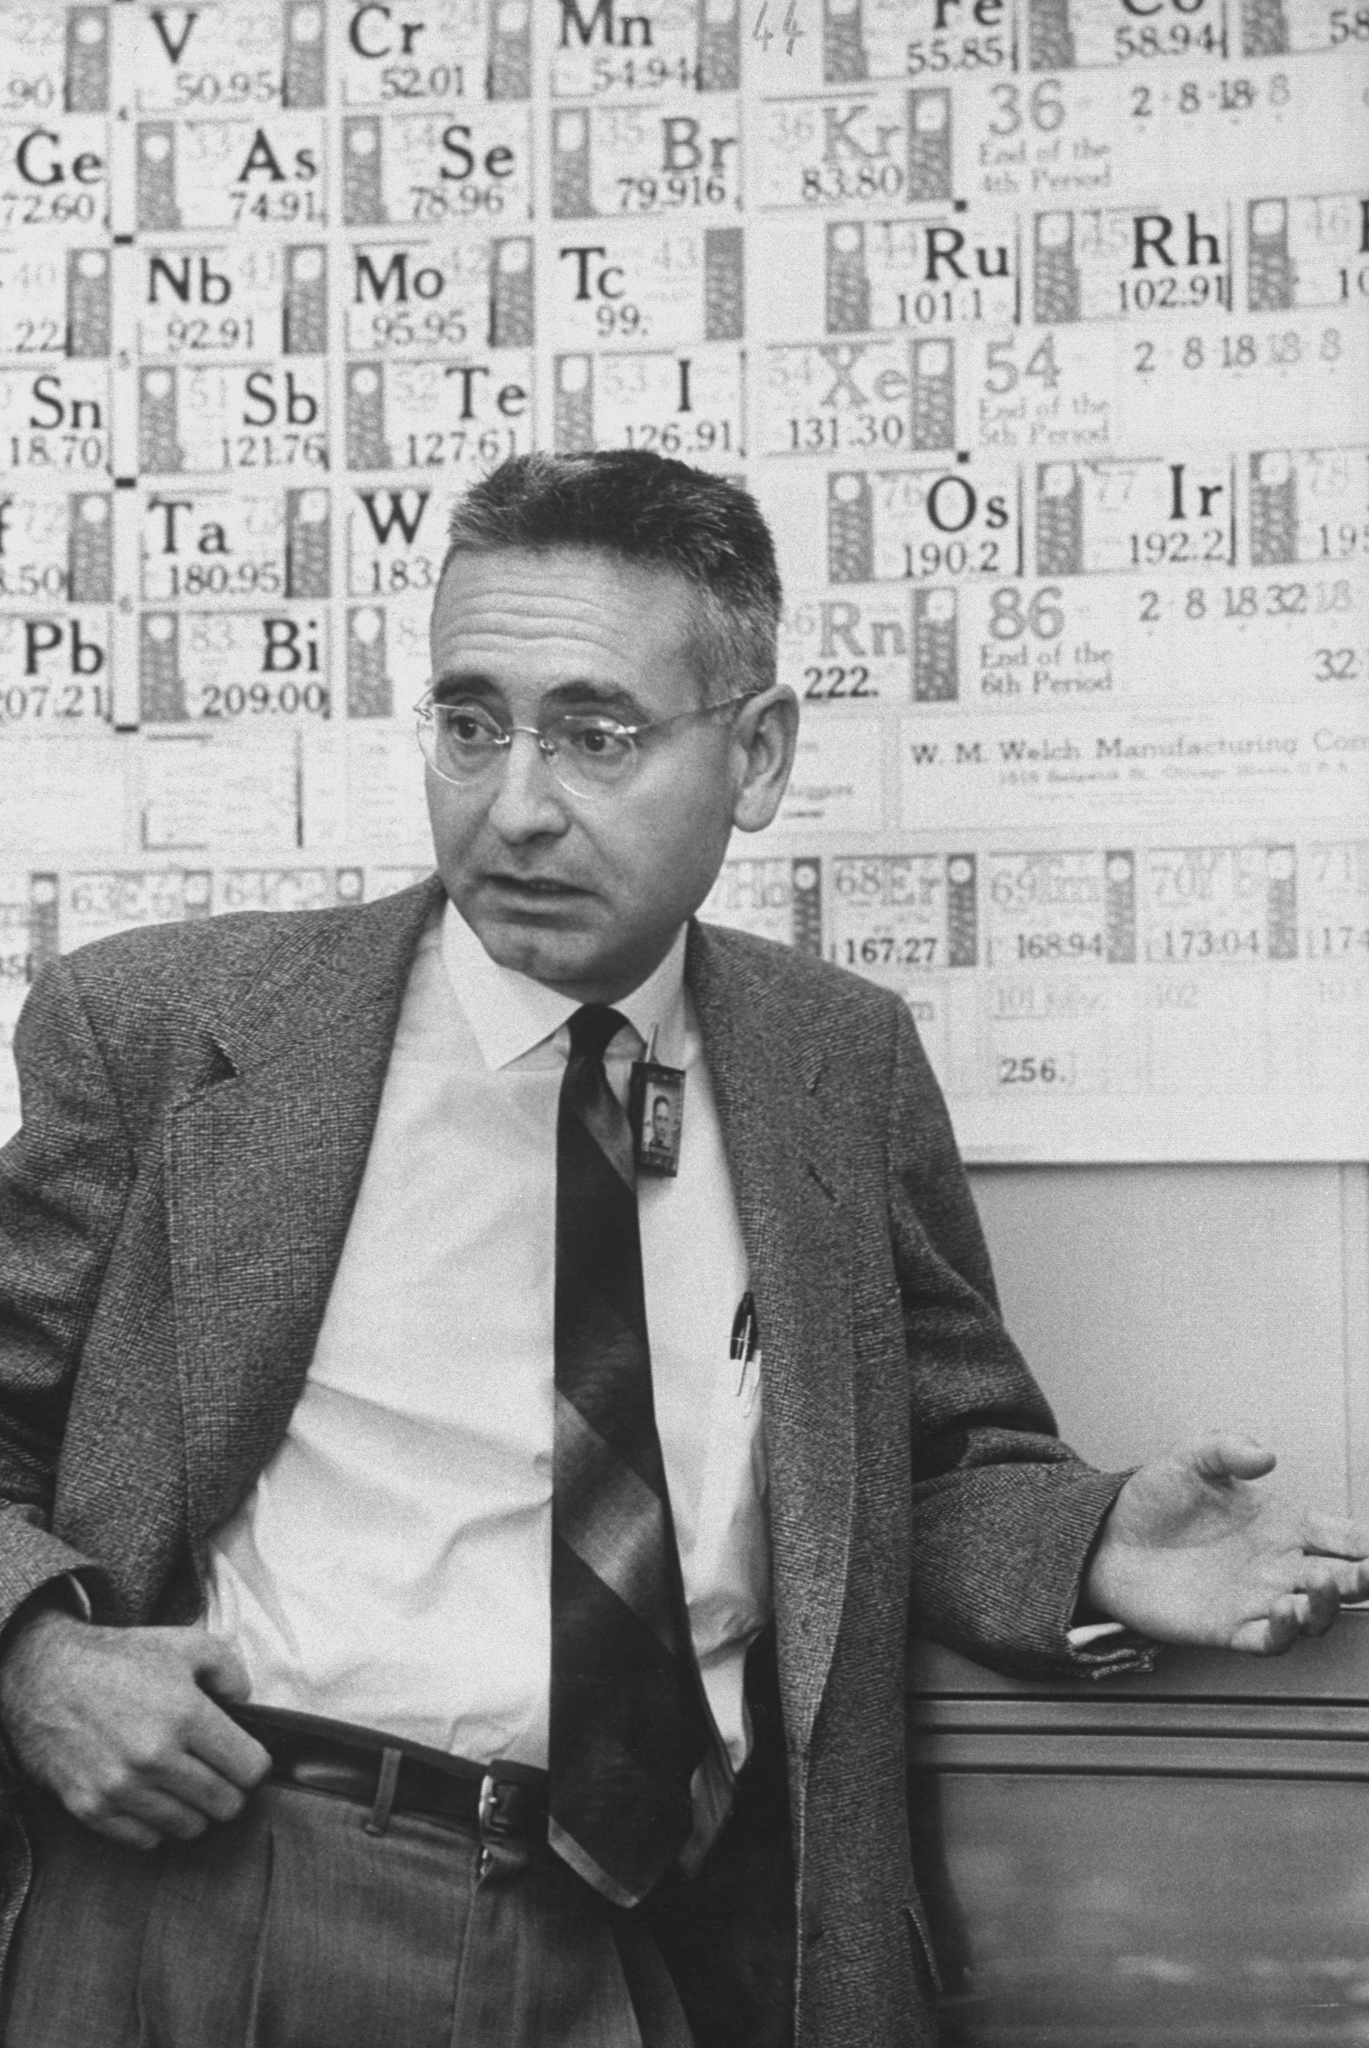 Alvin Weinberg in 1957